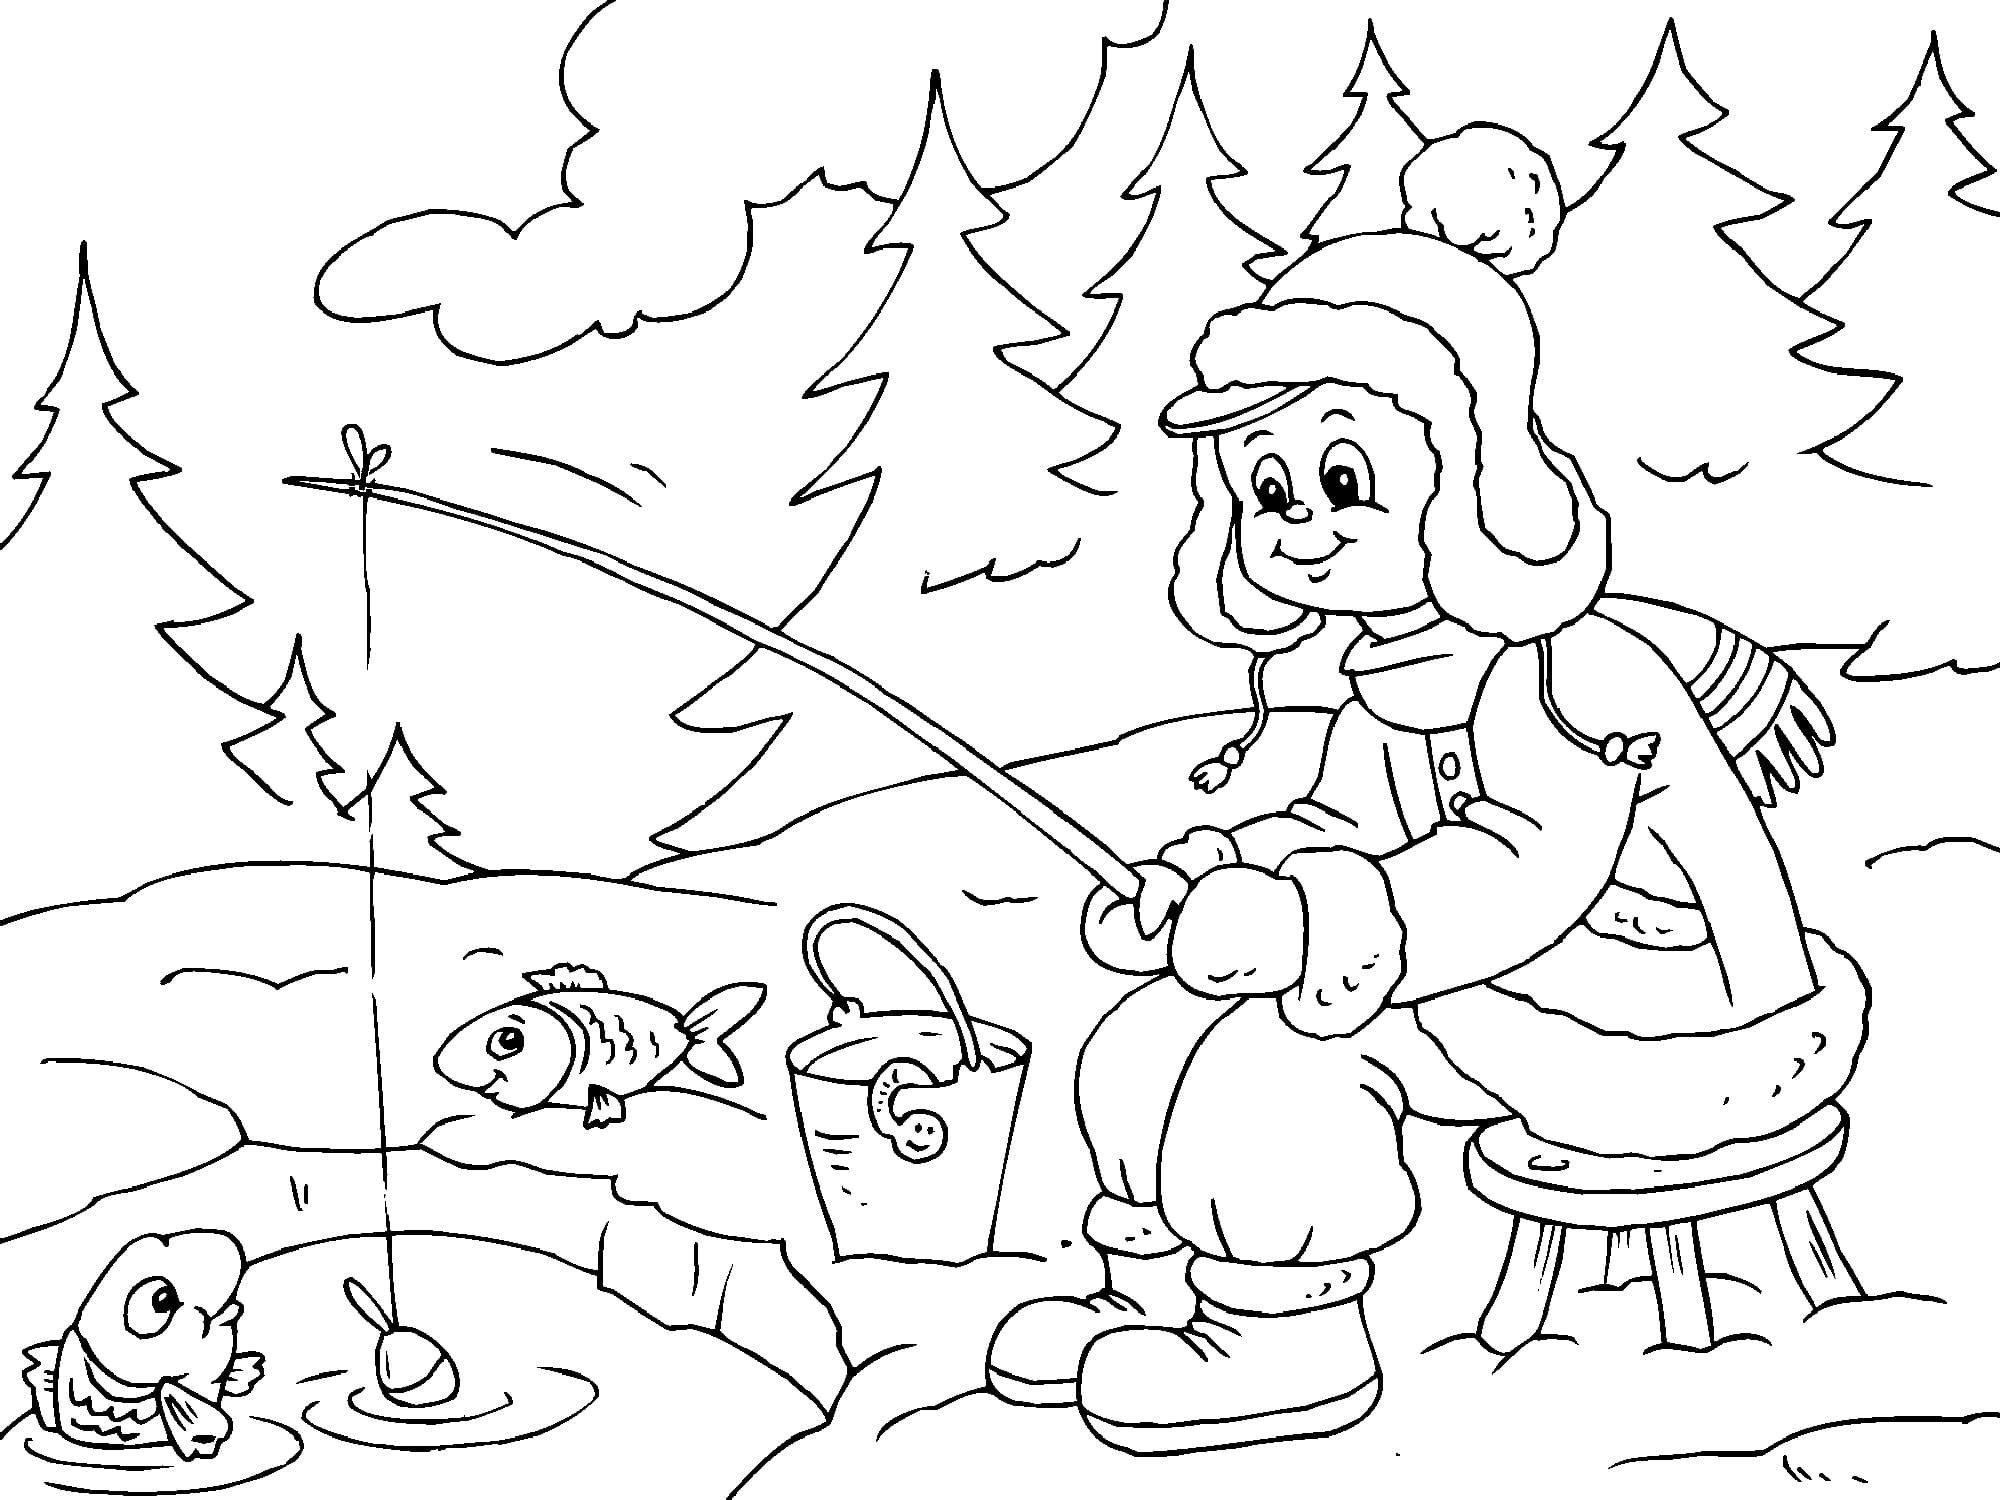 Malvorlagen Winter in 6  Malvorlagen, Malvorlagen gratis